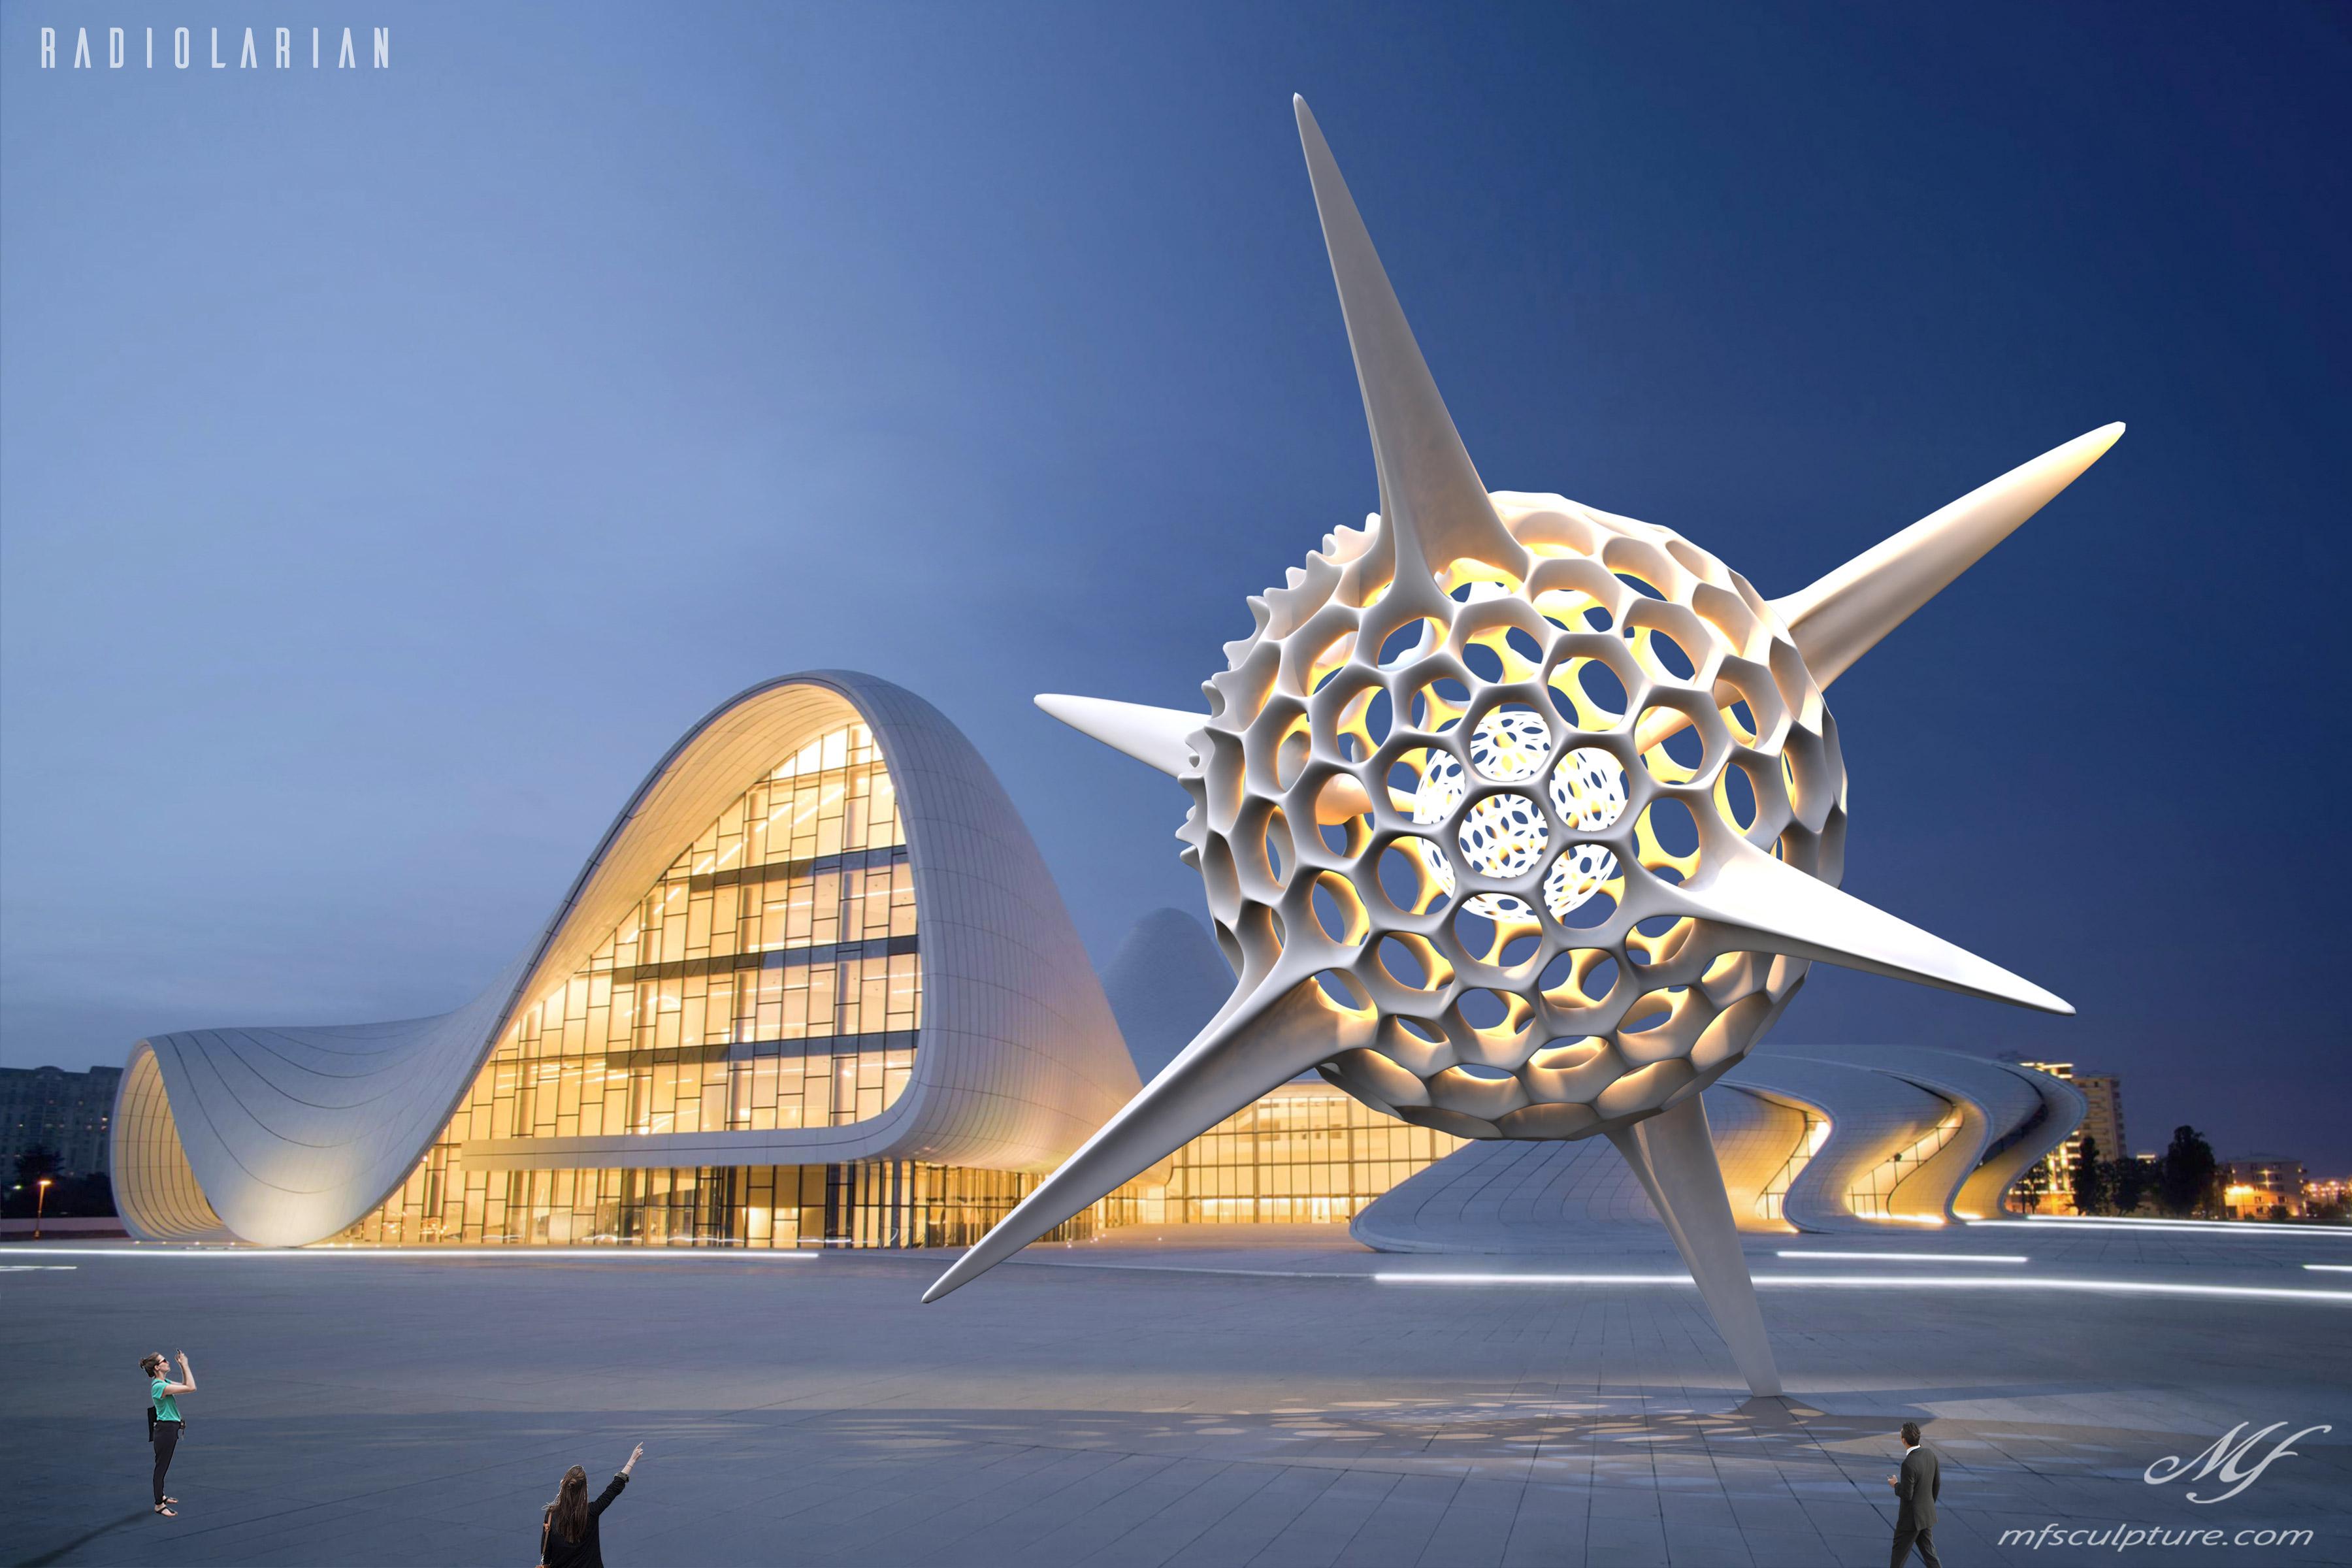 Heydar Aliyev Zaha Hadid Convergence Modern Sculpture Public Art Radiolarian Science Sea Creature 2